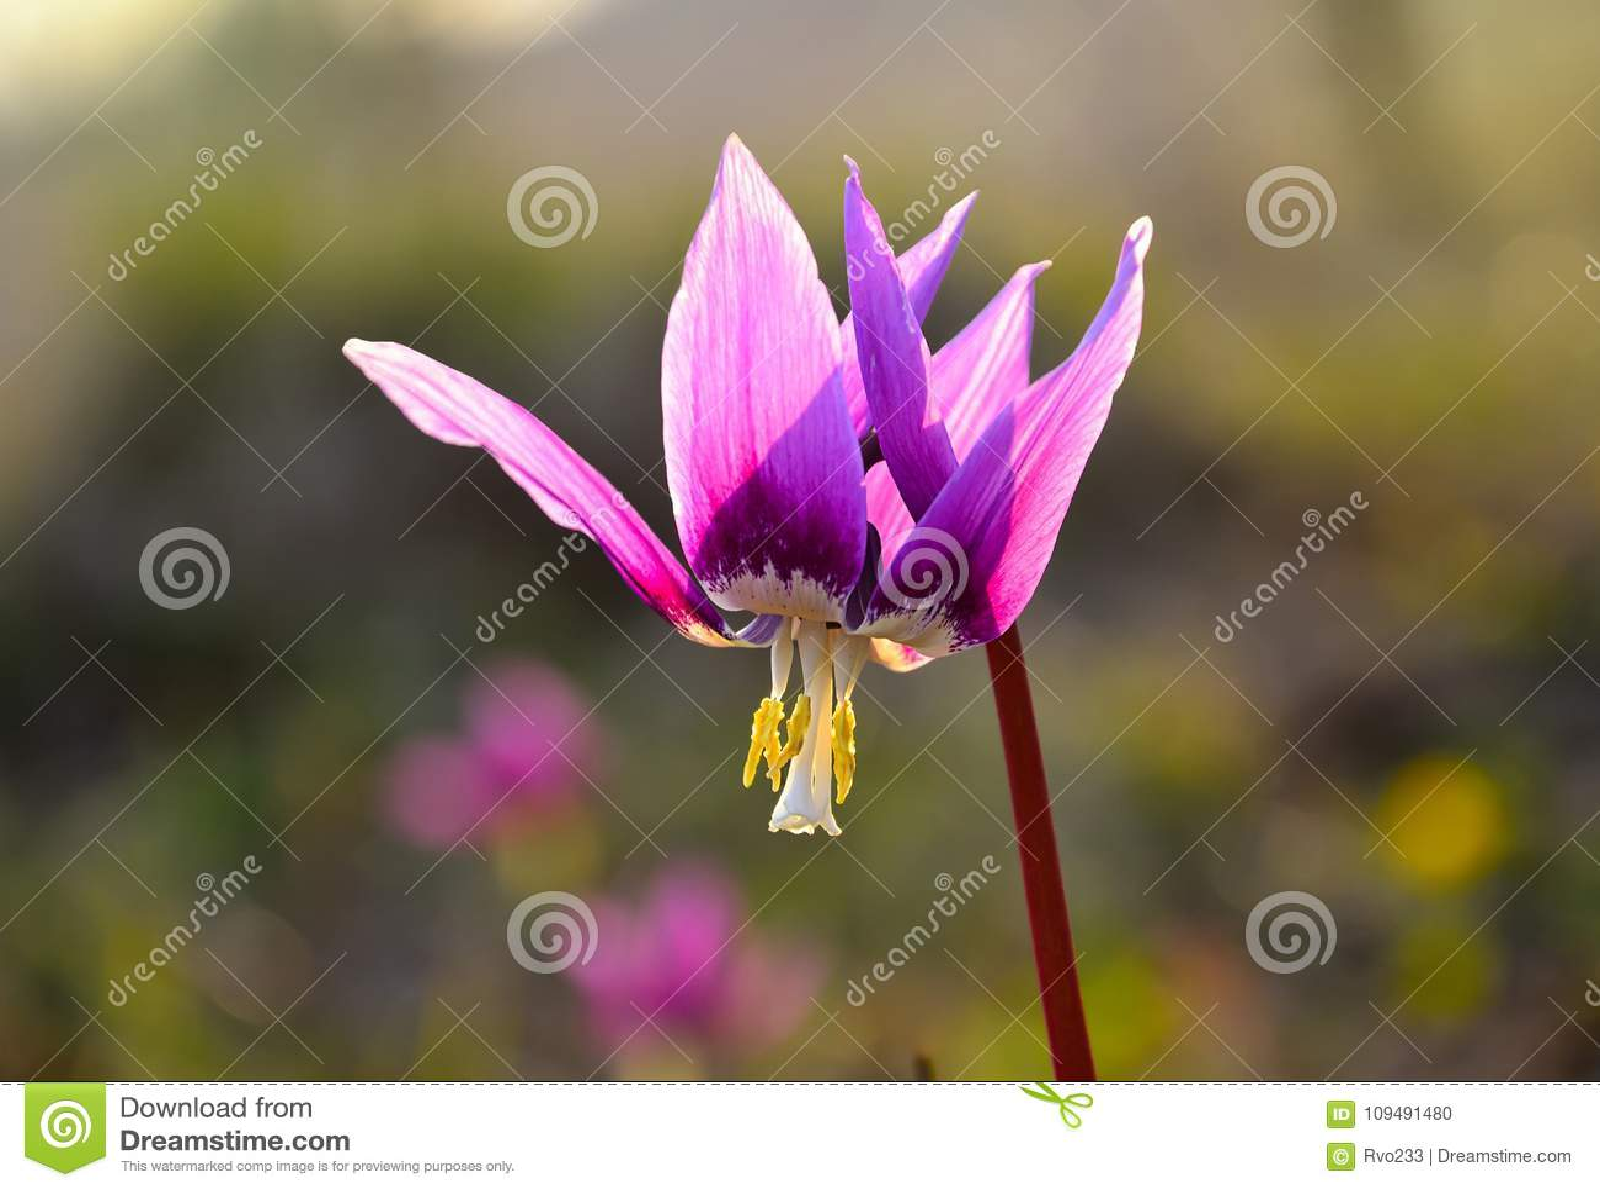 Early Spring Purple Flower Erythronium Sibiricum Close Up Stock